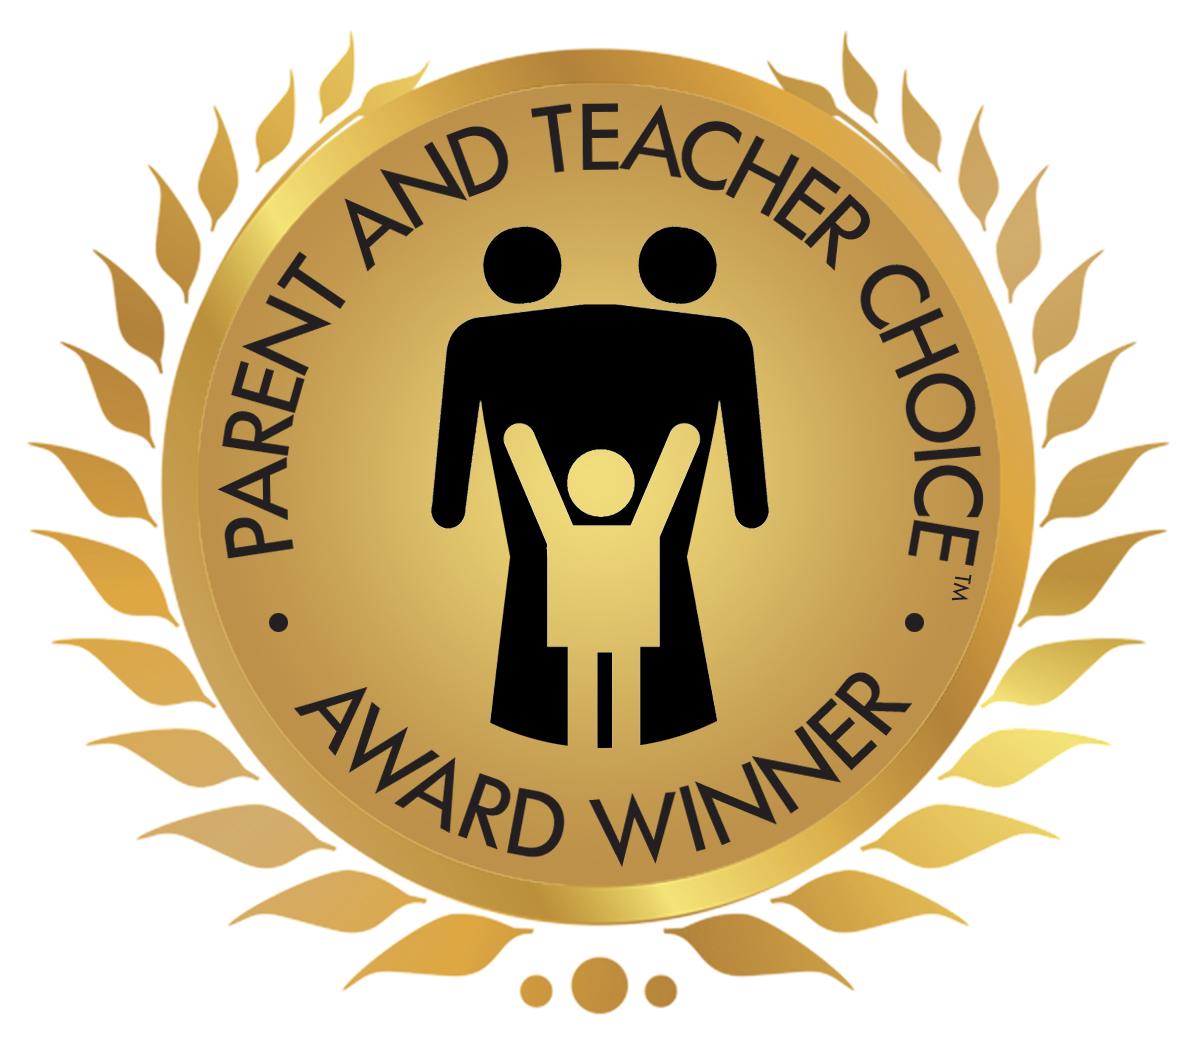 multiplication education winner of parent and teacher choice